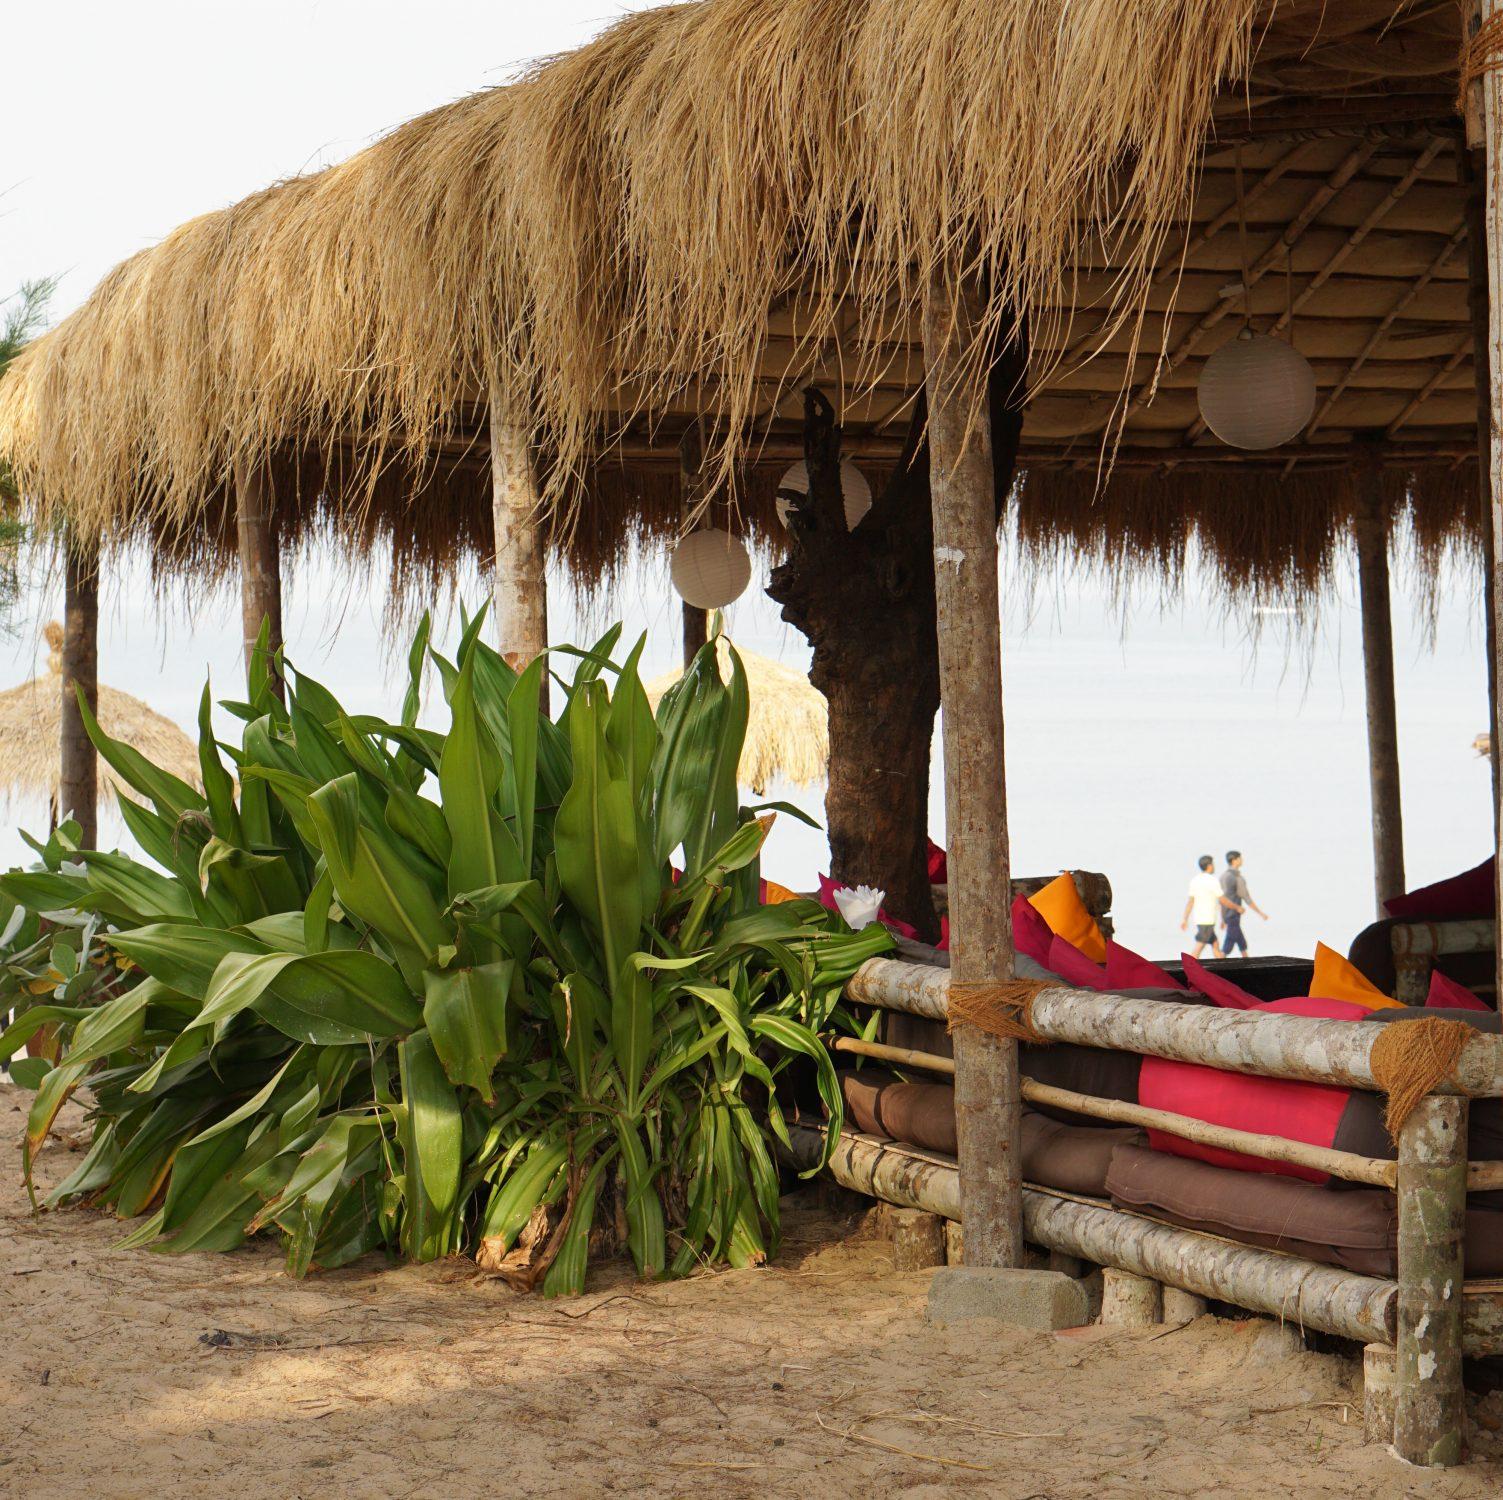 Gallery of Bamboo Yoga Retreat in Patnem beach, Goa